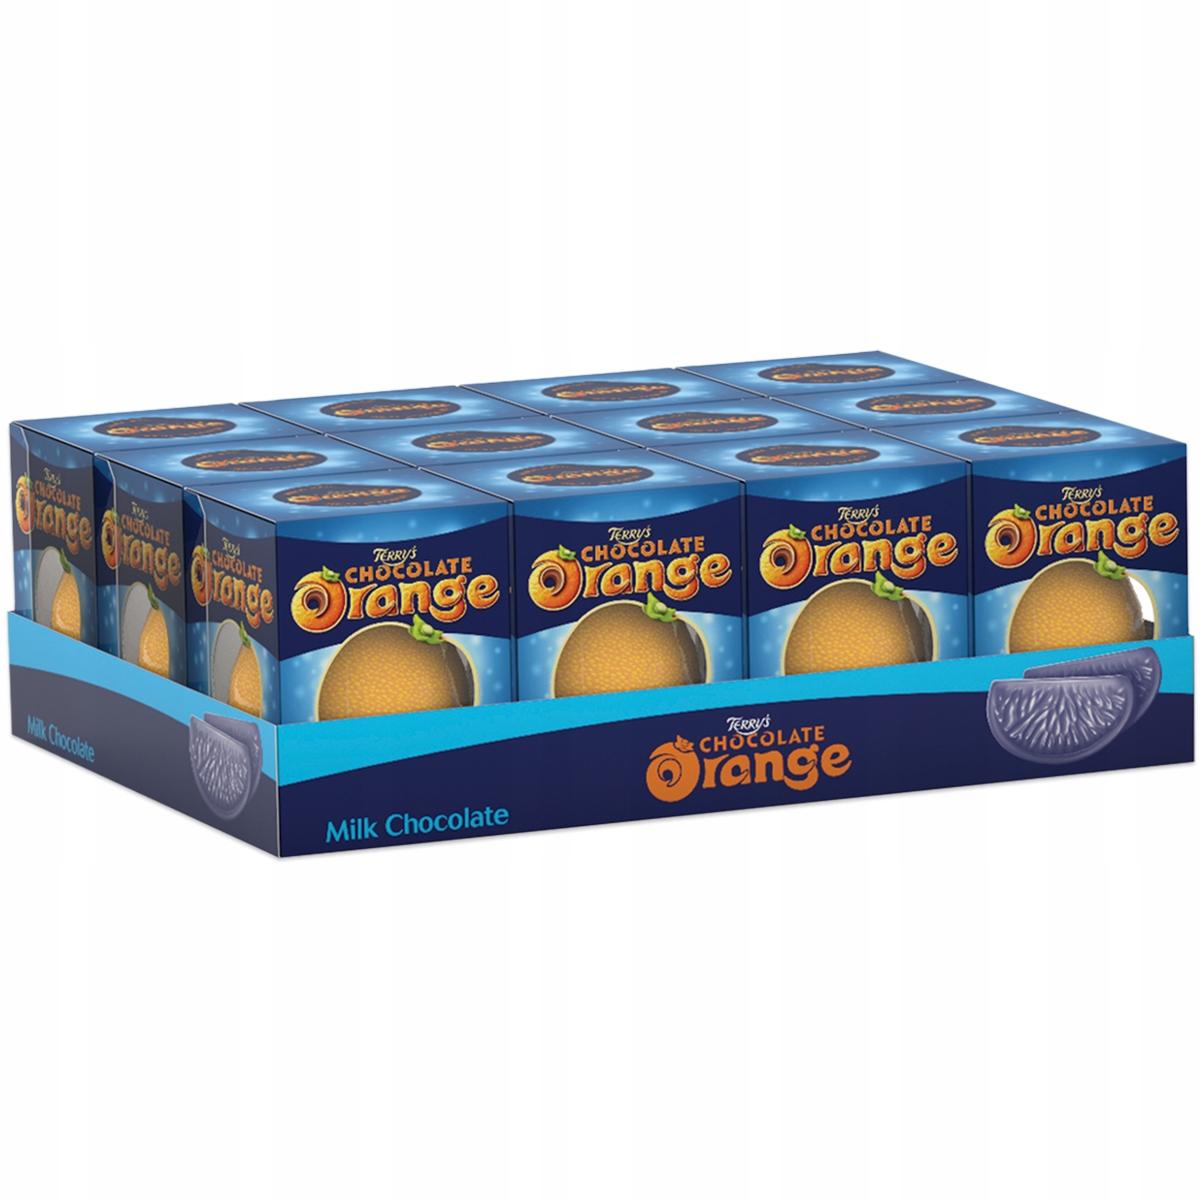 Terry's Čokoláda Orange Čokoláda 12 x 157g UK